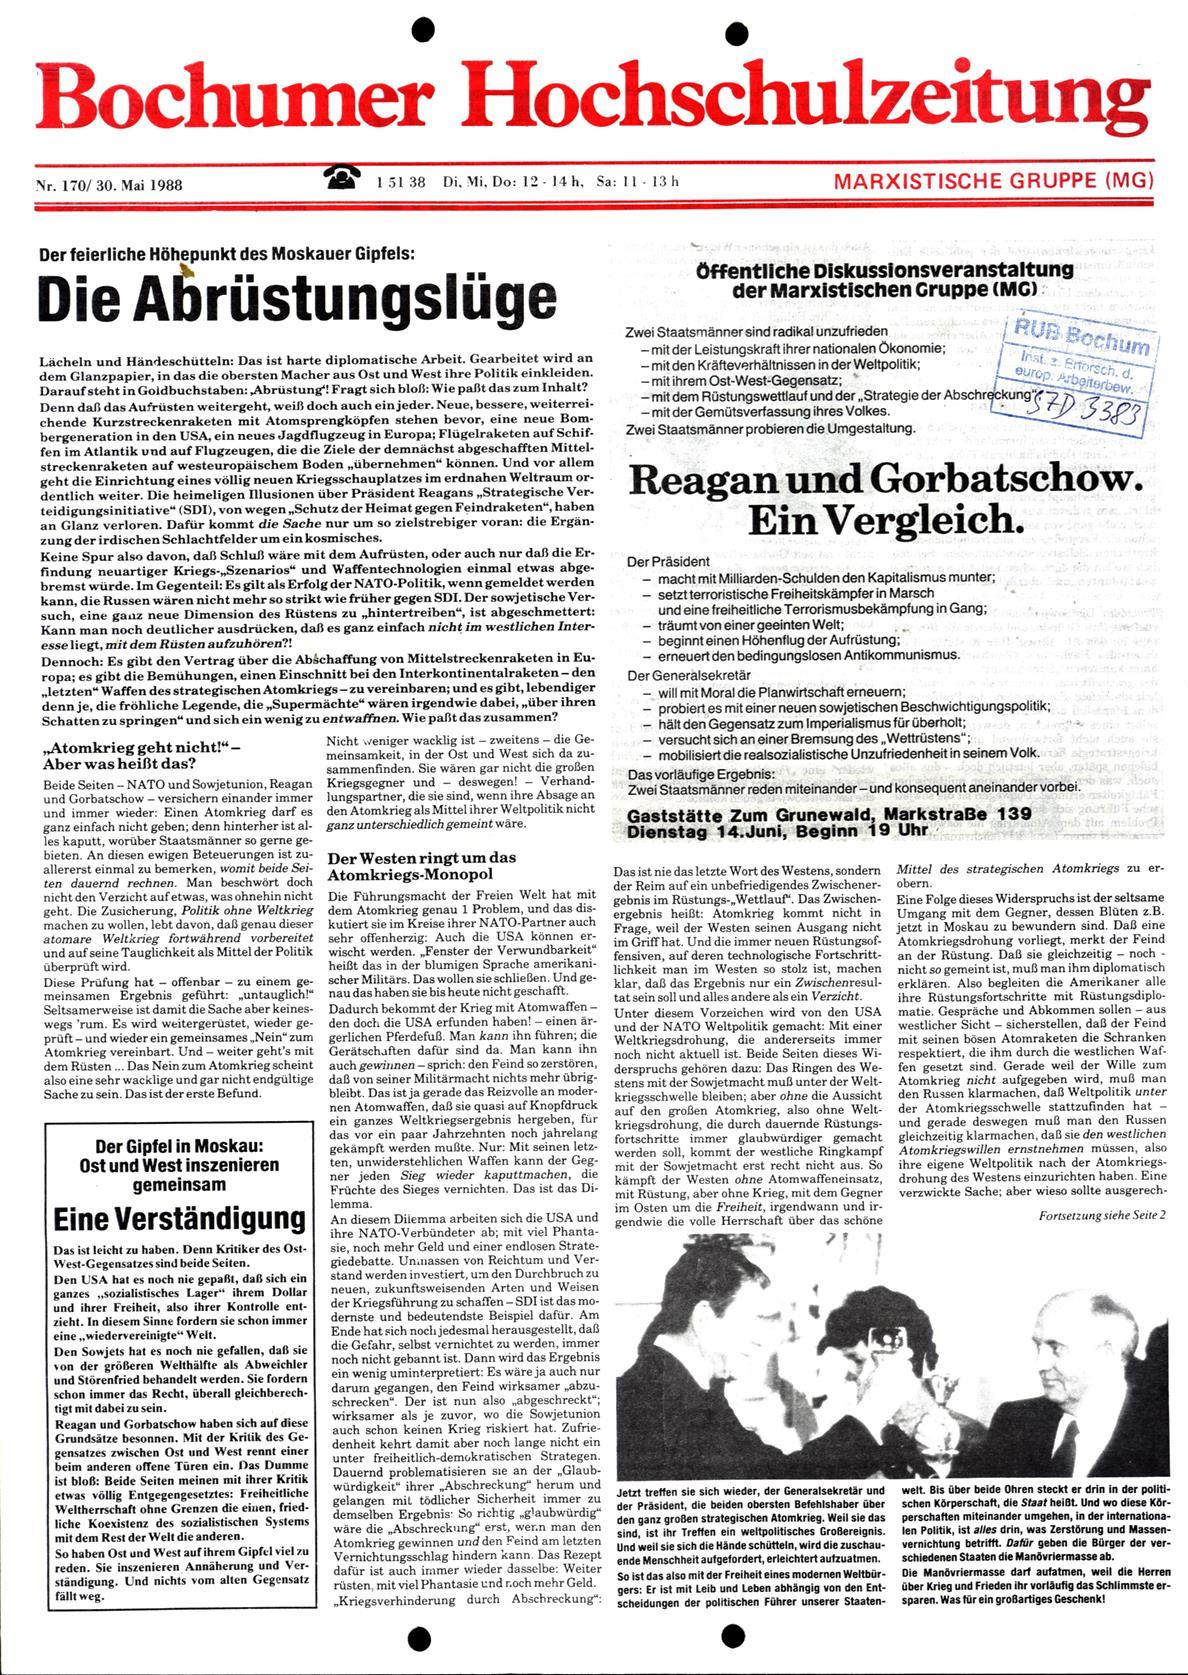 Bochum_BHZ_19880530_170_001